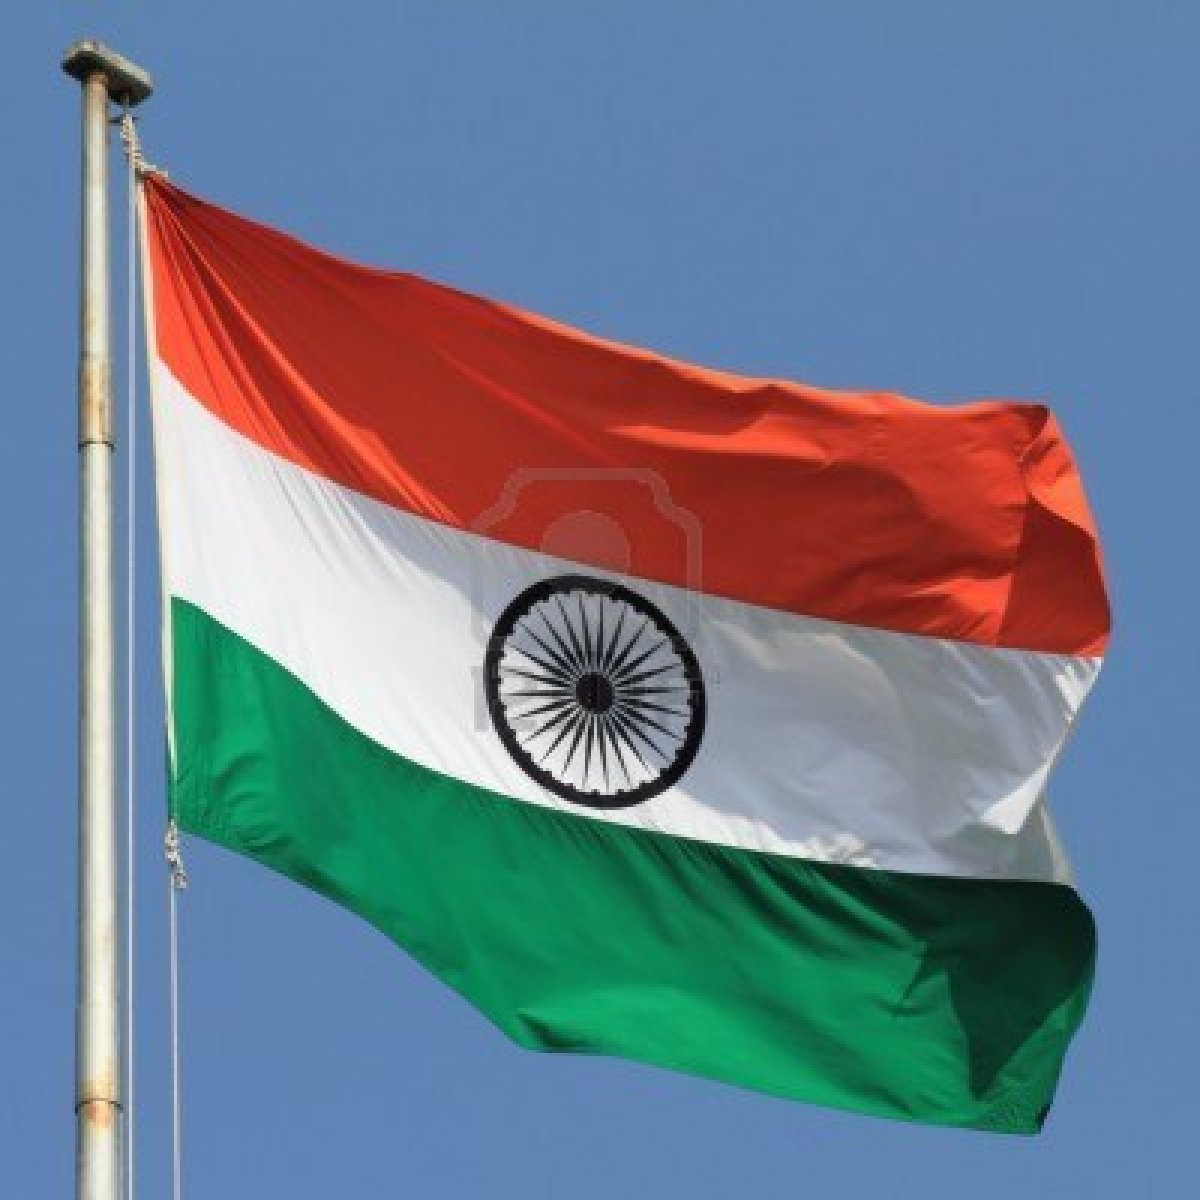 Hd wallpaper indian - Indian Flag High Resolution Wallpapers Fine Hd Wallpapers Download